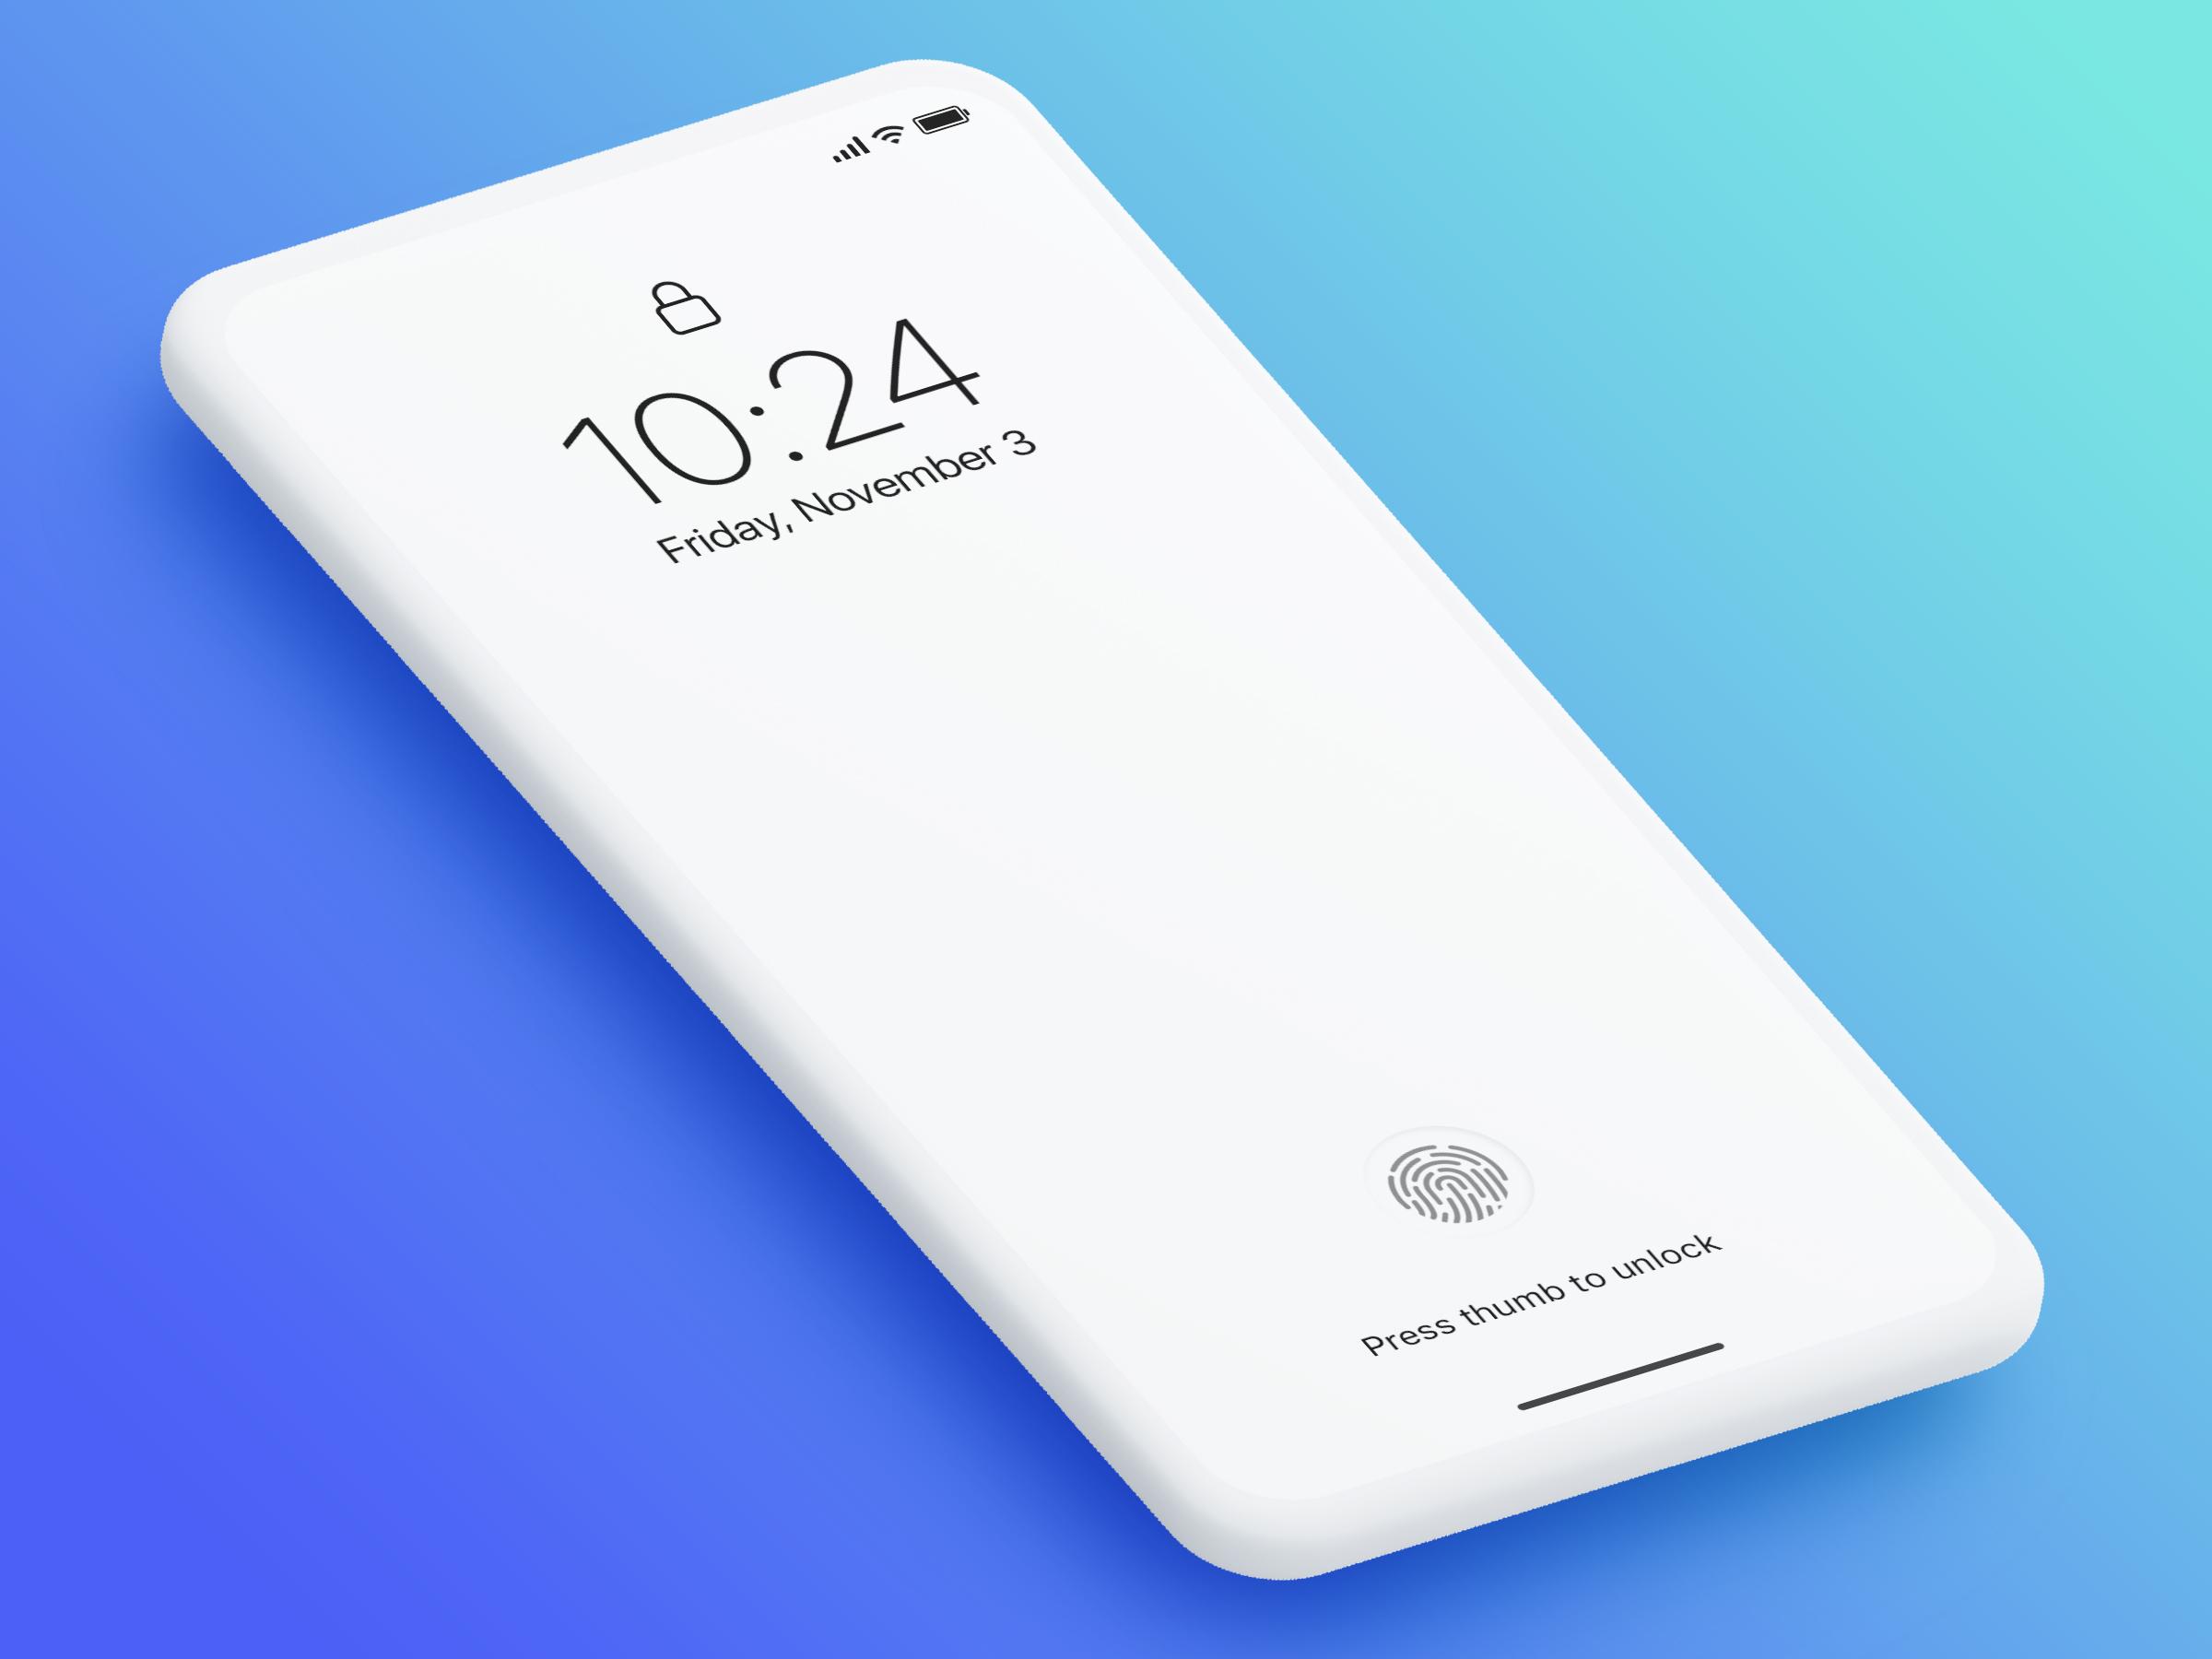 Kaseyrandall iphone concept future ui mobile fingerprint embedded dribbble3